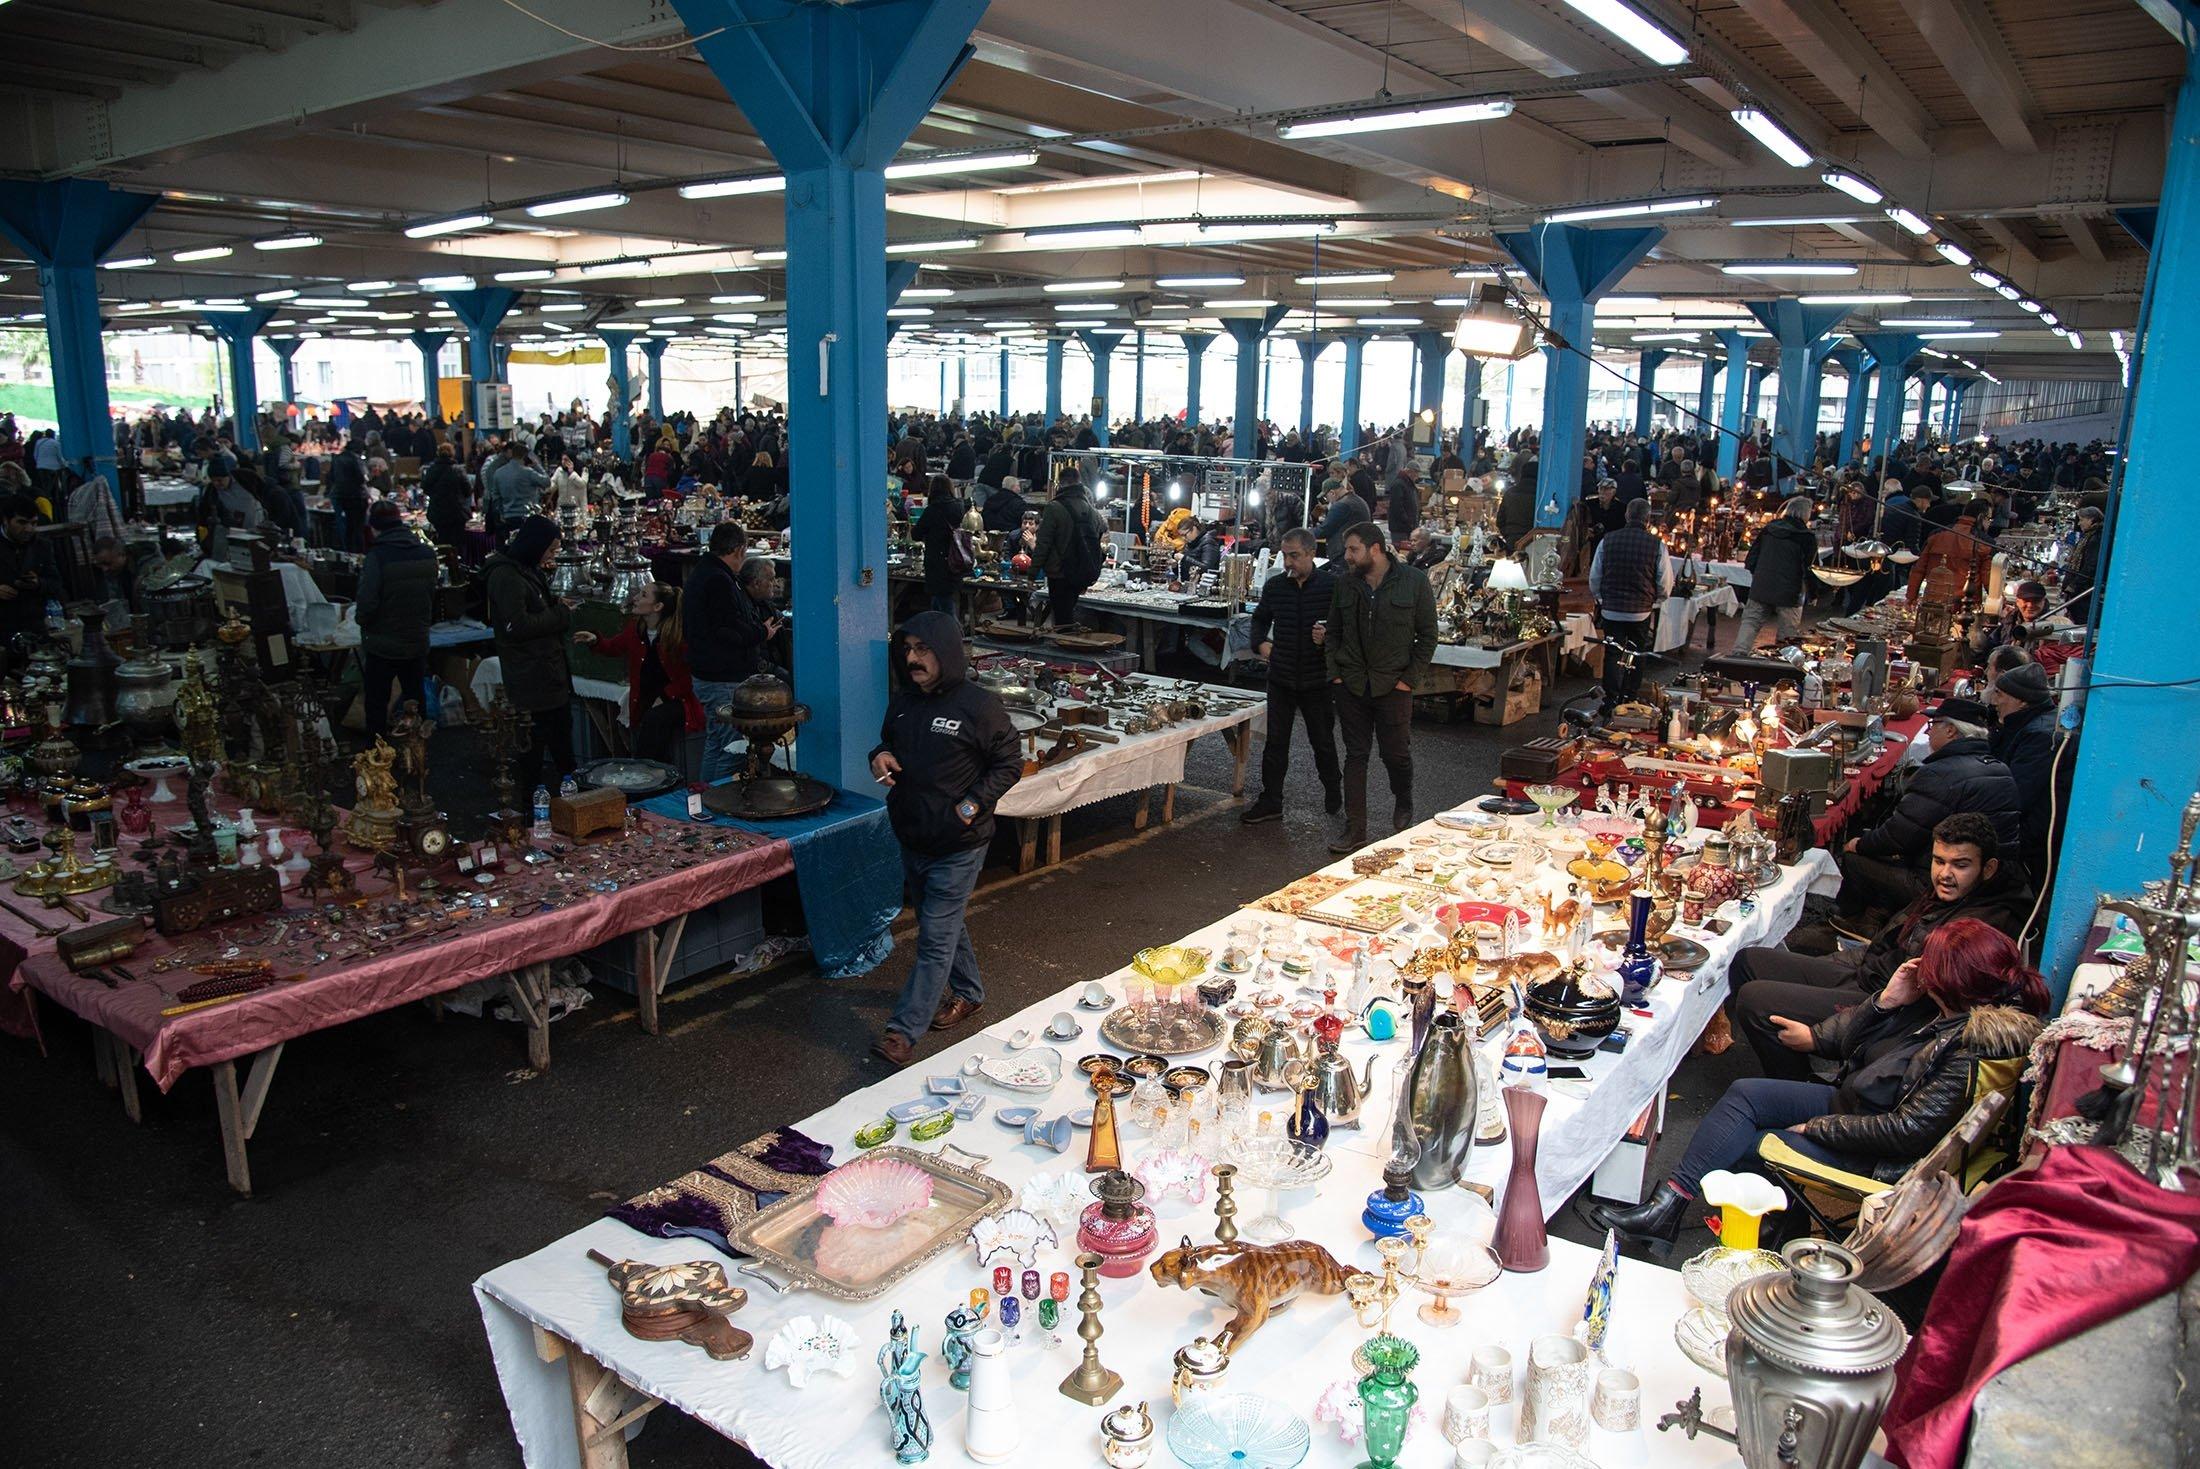 The Bomonti Antique Market. (Shutterstock Photo)